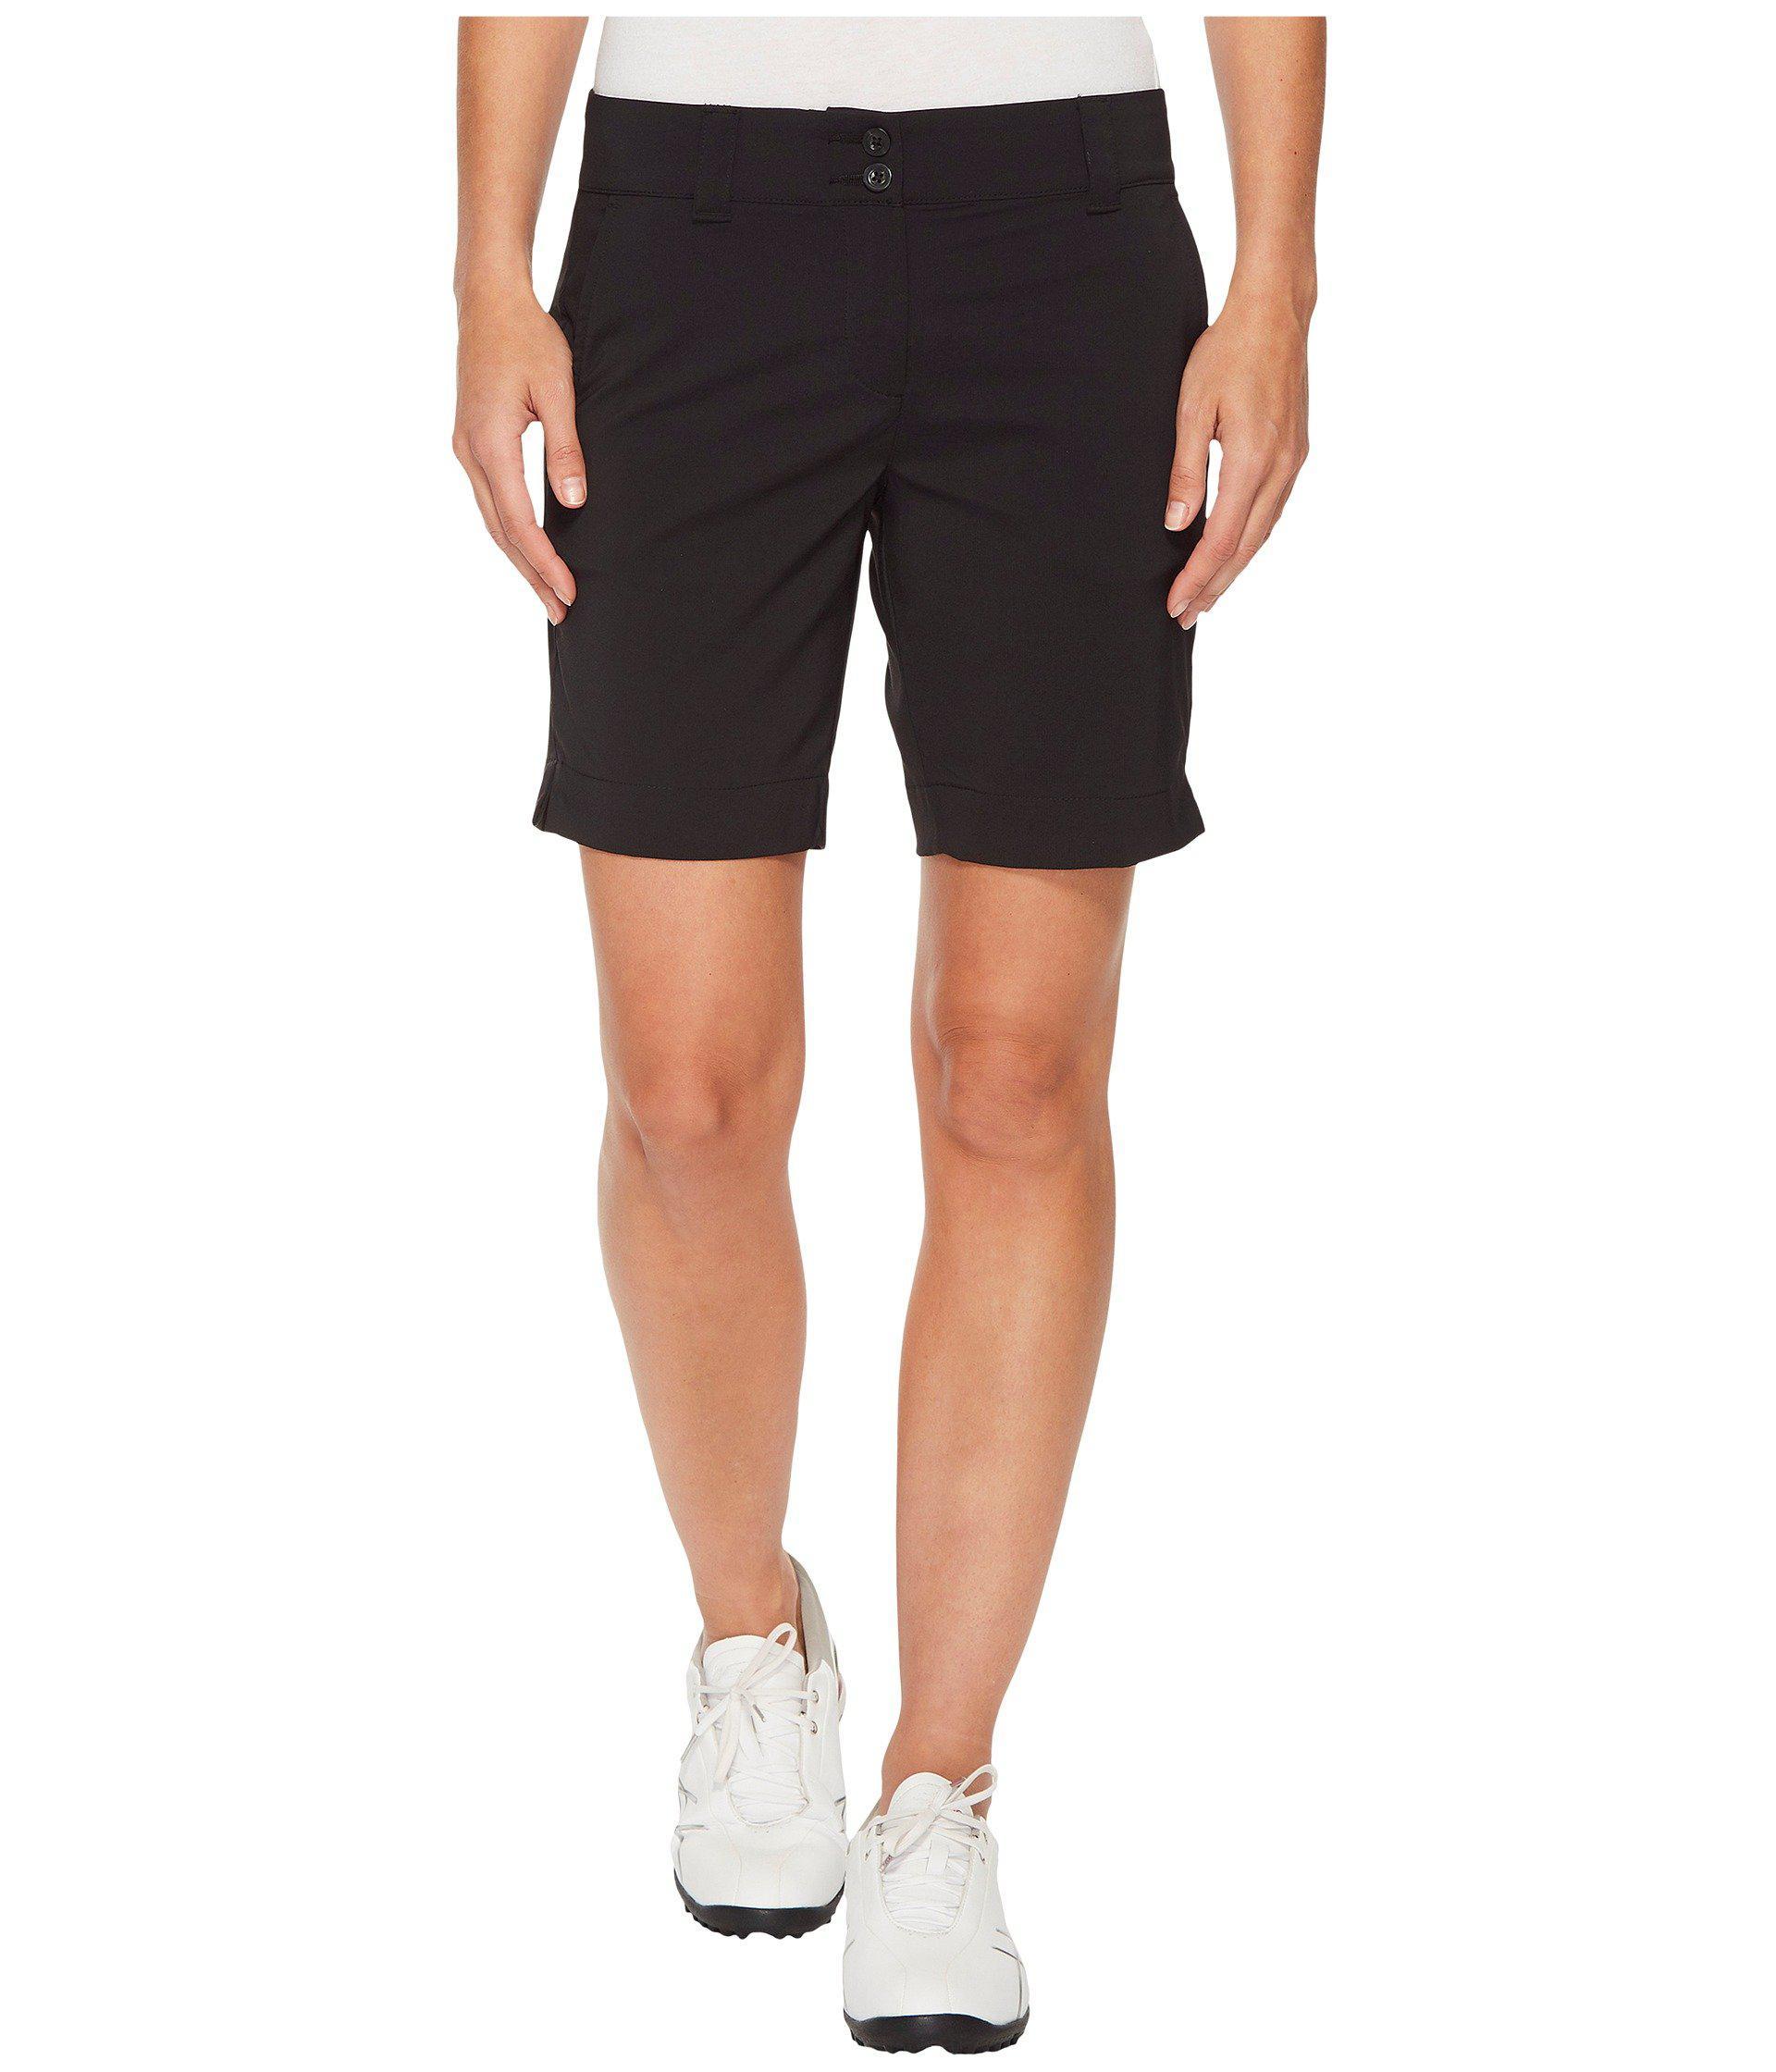 e2168213fdaa Lyst - Skechers High Side Shorts in Black for Men